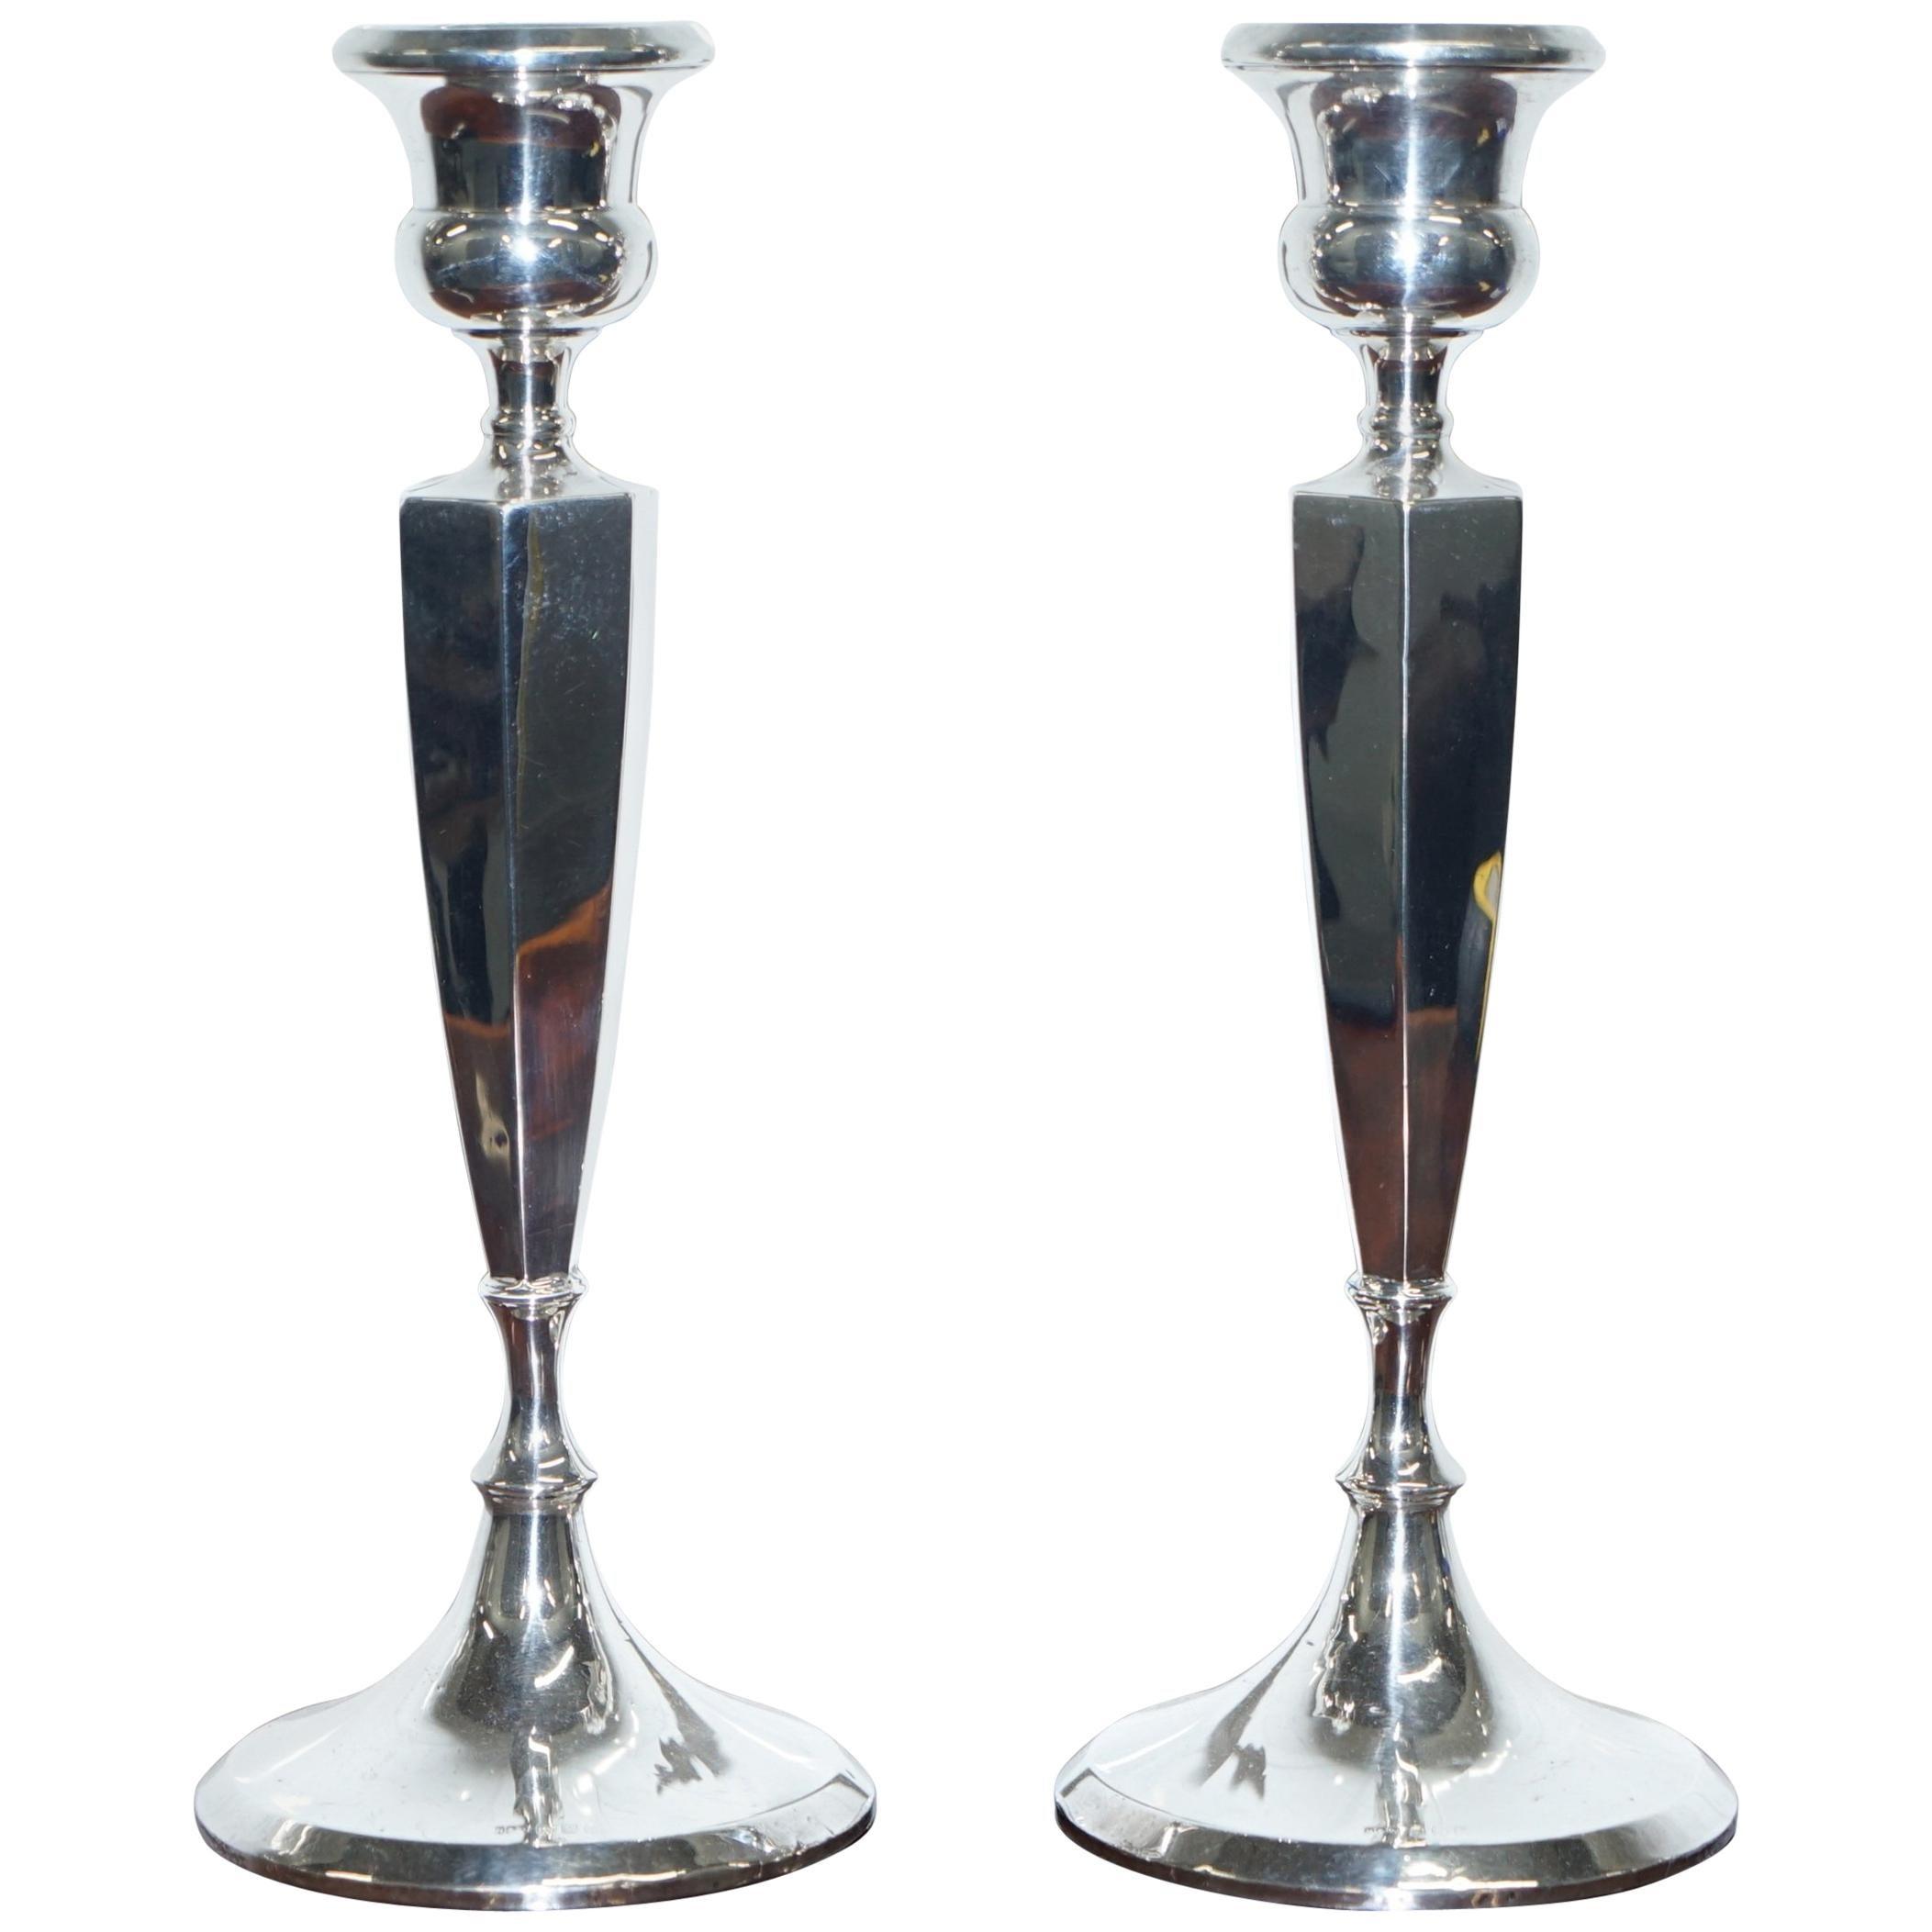 Pair of Lovely Large King George V Sterling Silver Candlesticks Birmingham, 1920